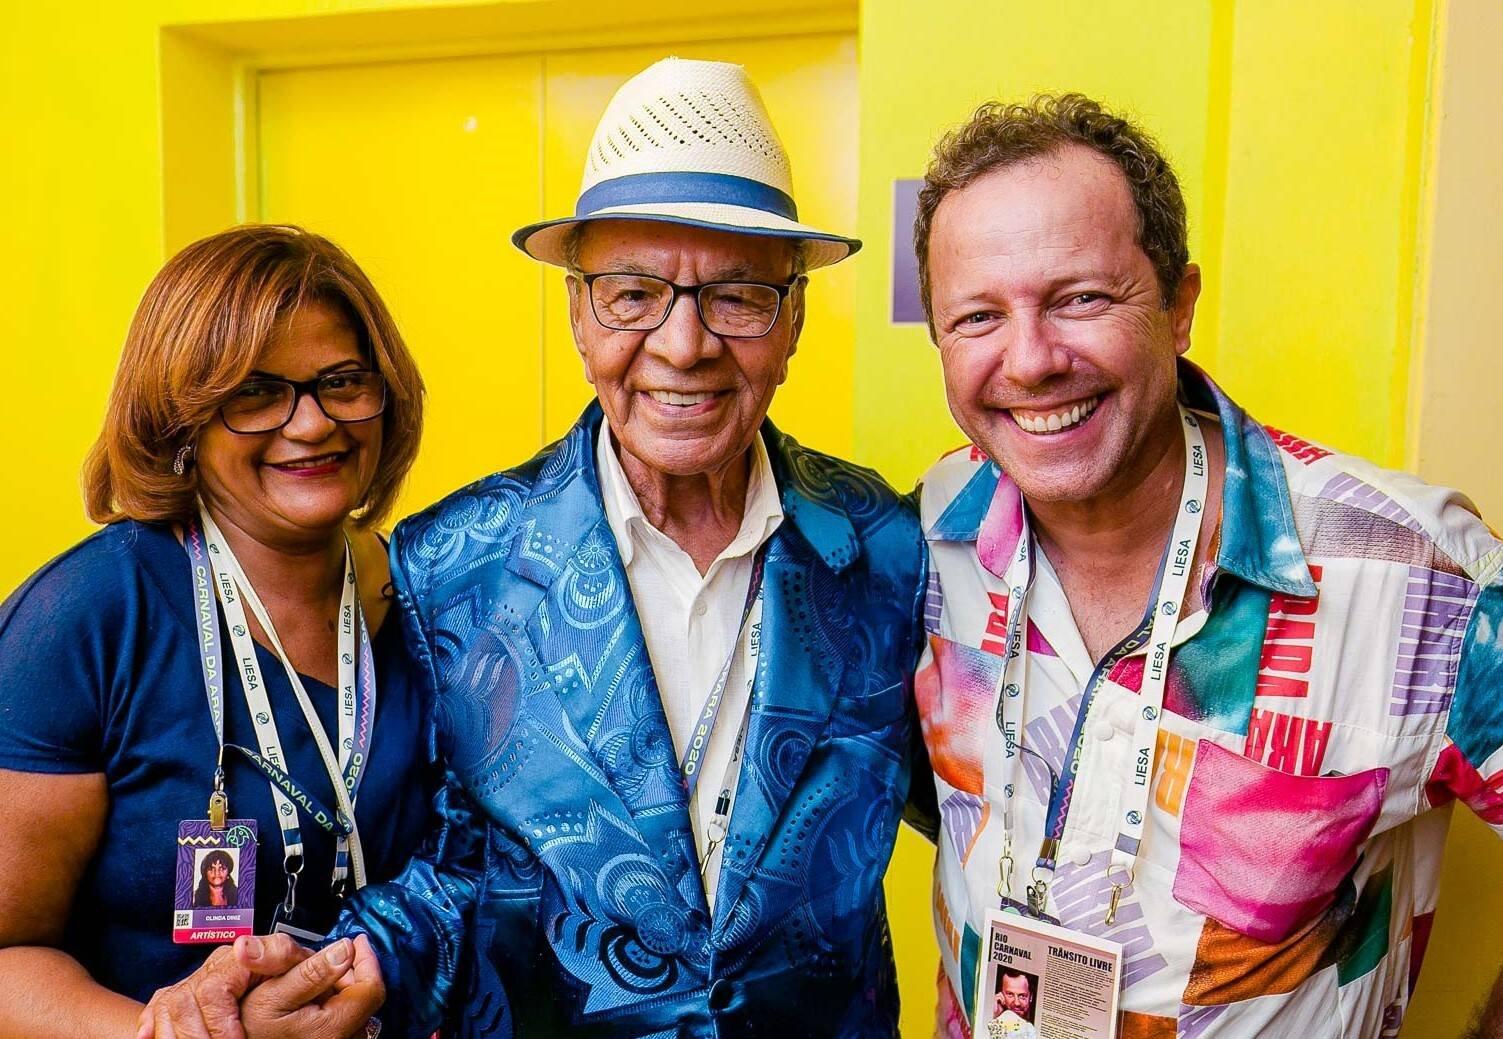 Olinda Diniz, Monarco e Vik Muniz /Foto: Bruno Ryfer